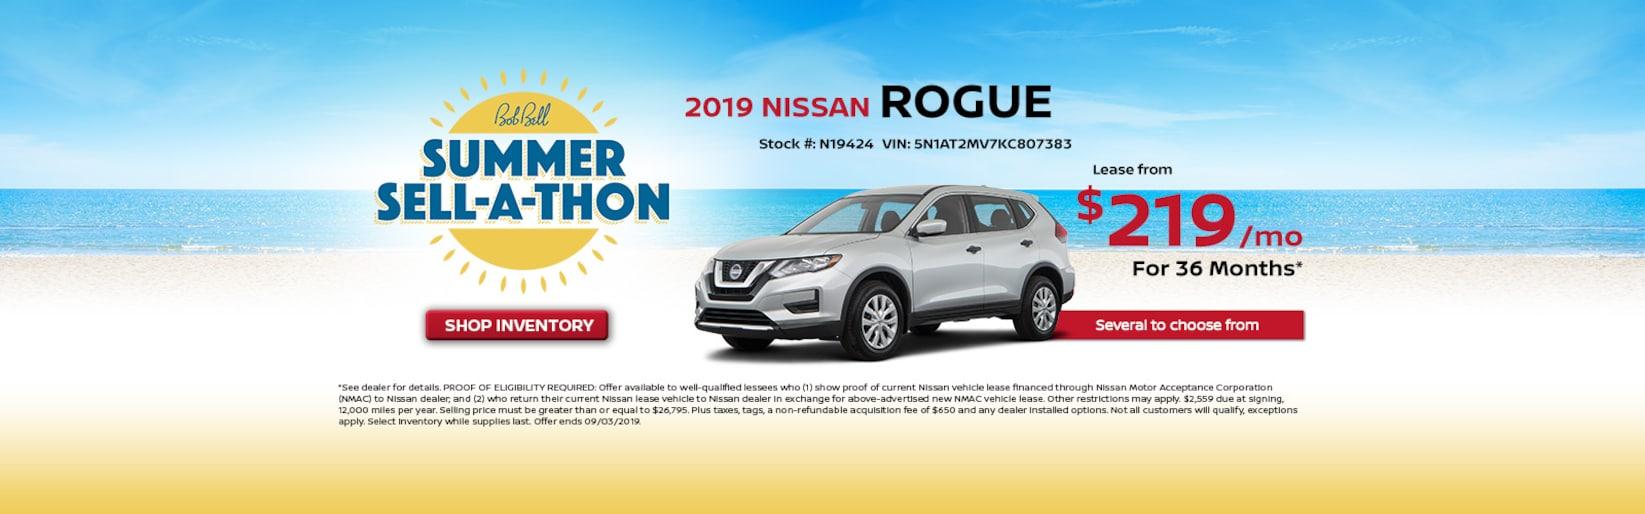 Nissan Dealership In Md >> New Nissan And Used Car Dealer Serving Baltimore Bob Bell Nissan